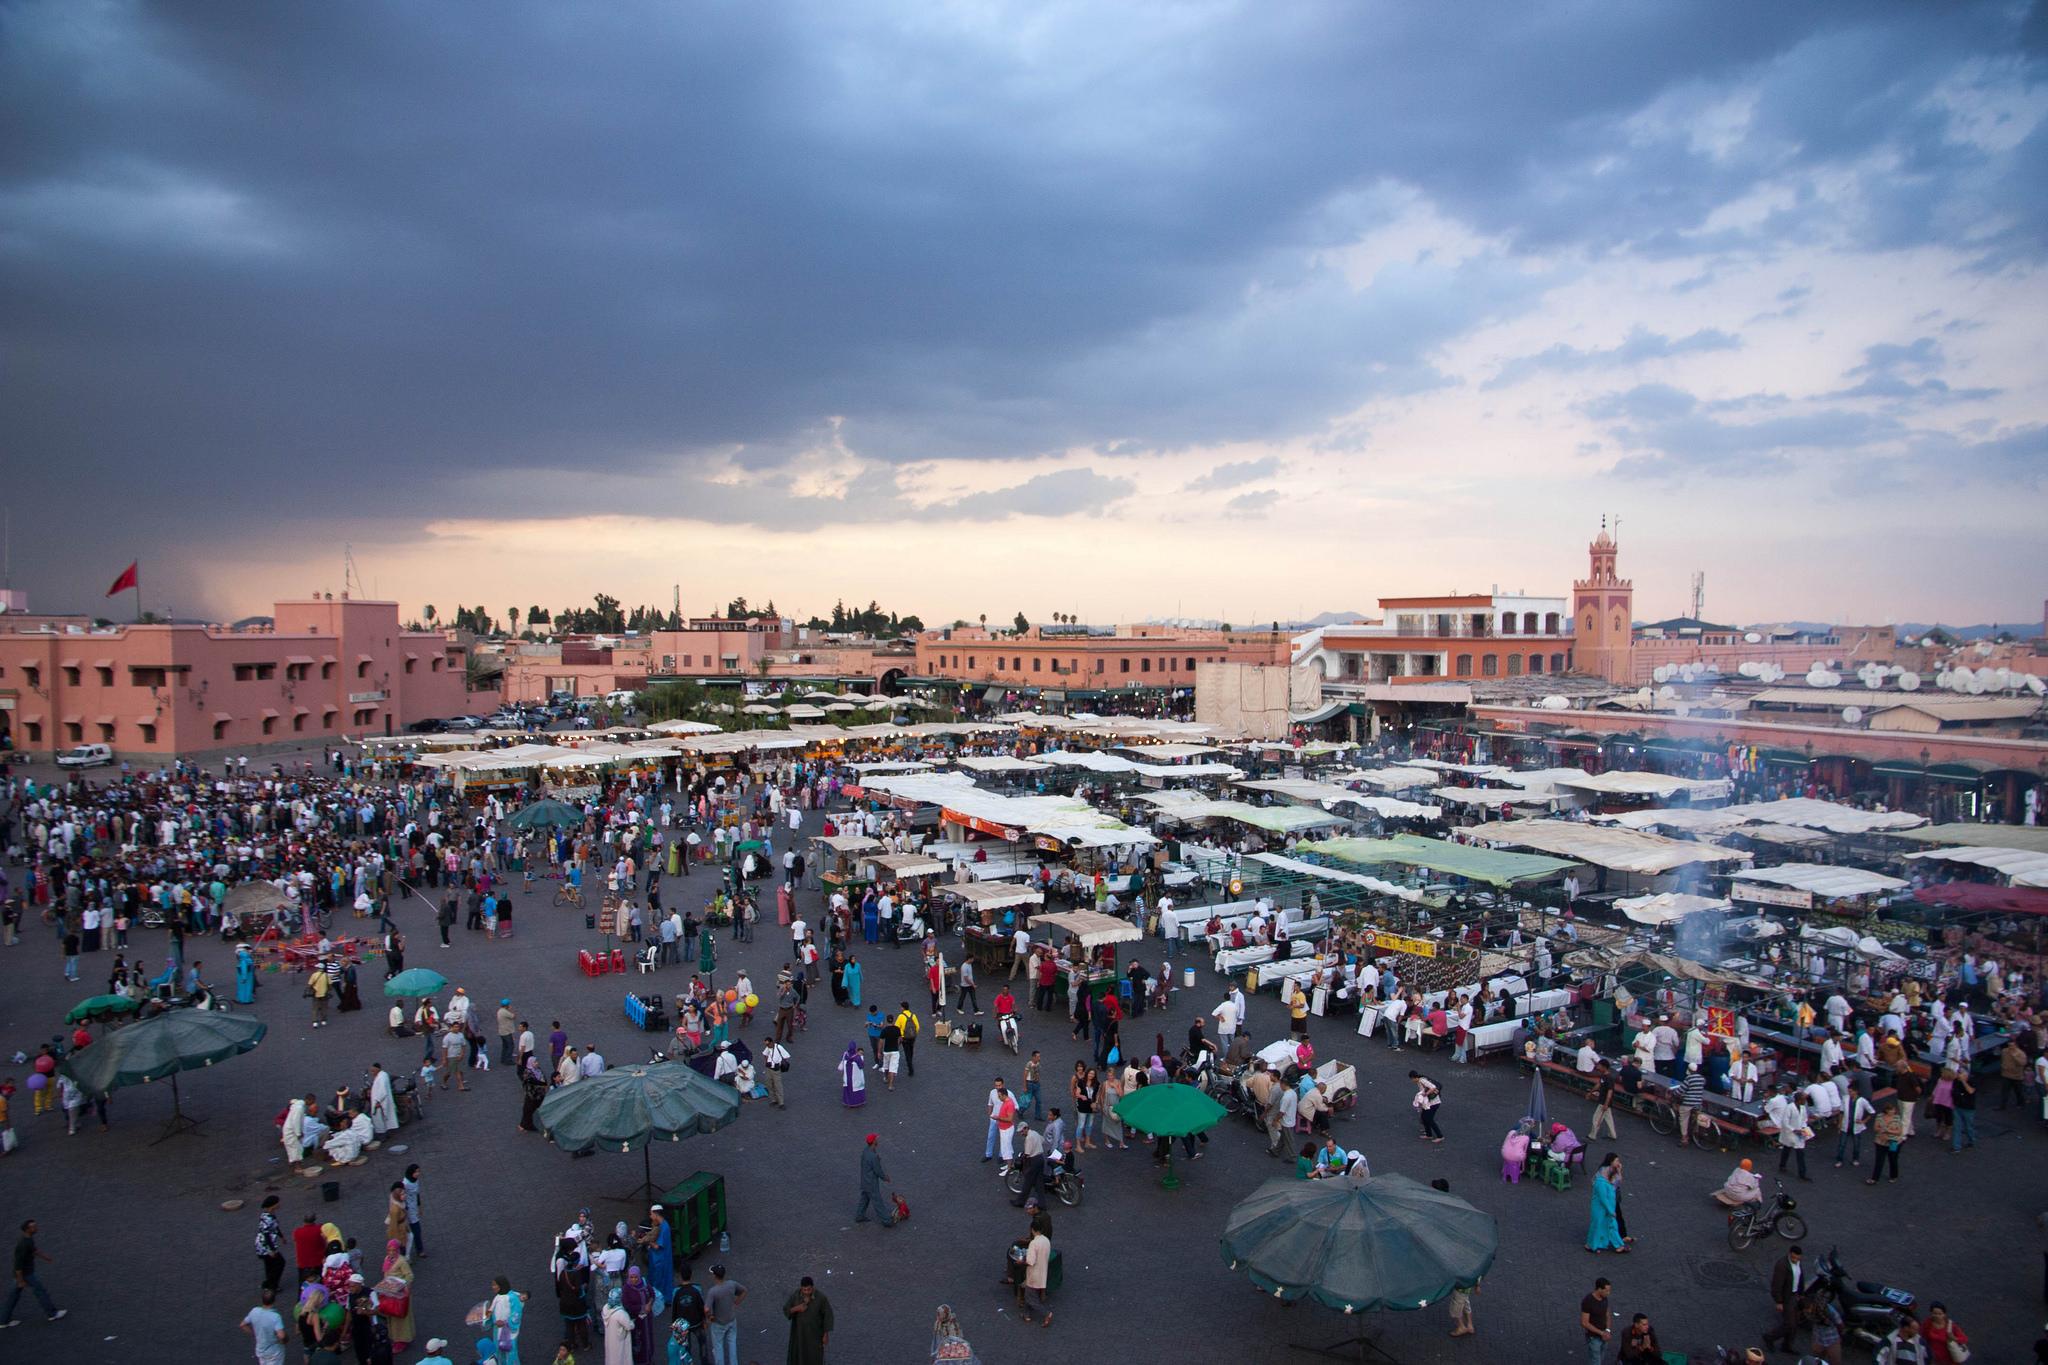 Gran ruta de marruecos descubre con tu coche de alquiler for Oficina de turismo de marruecos